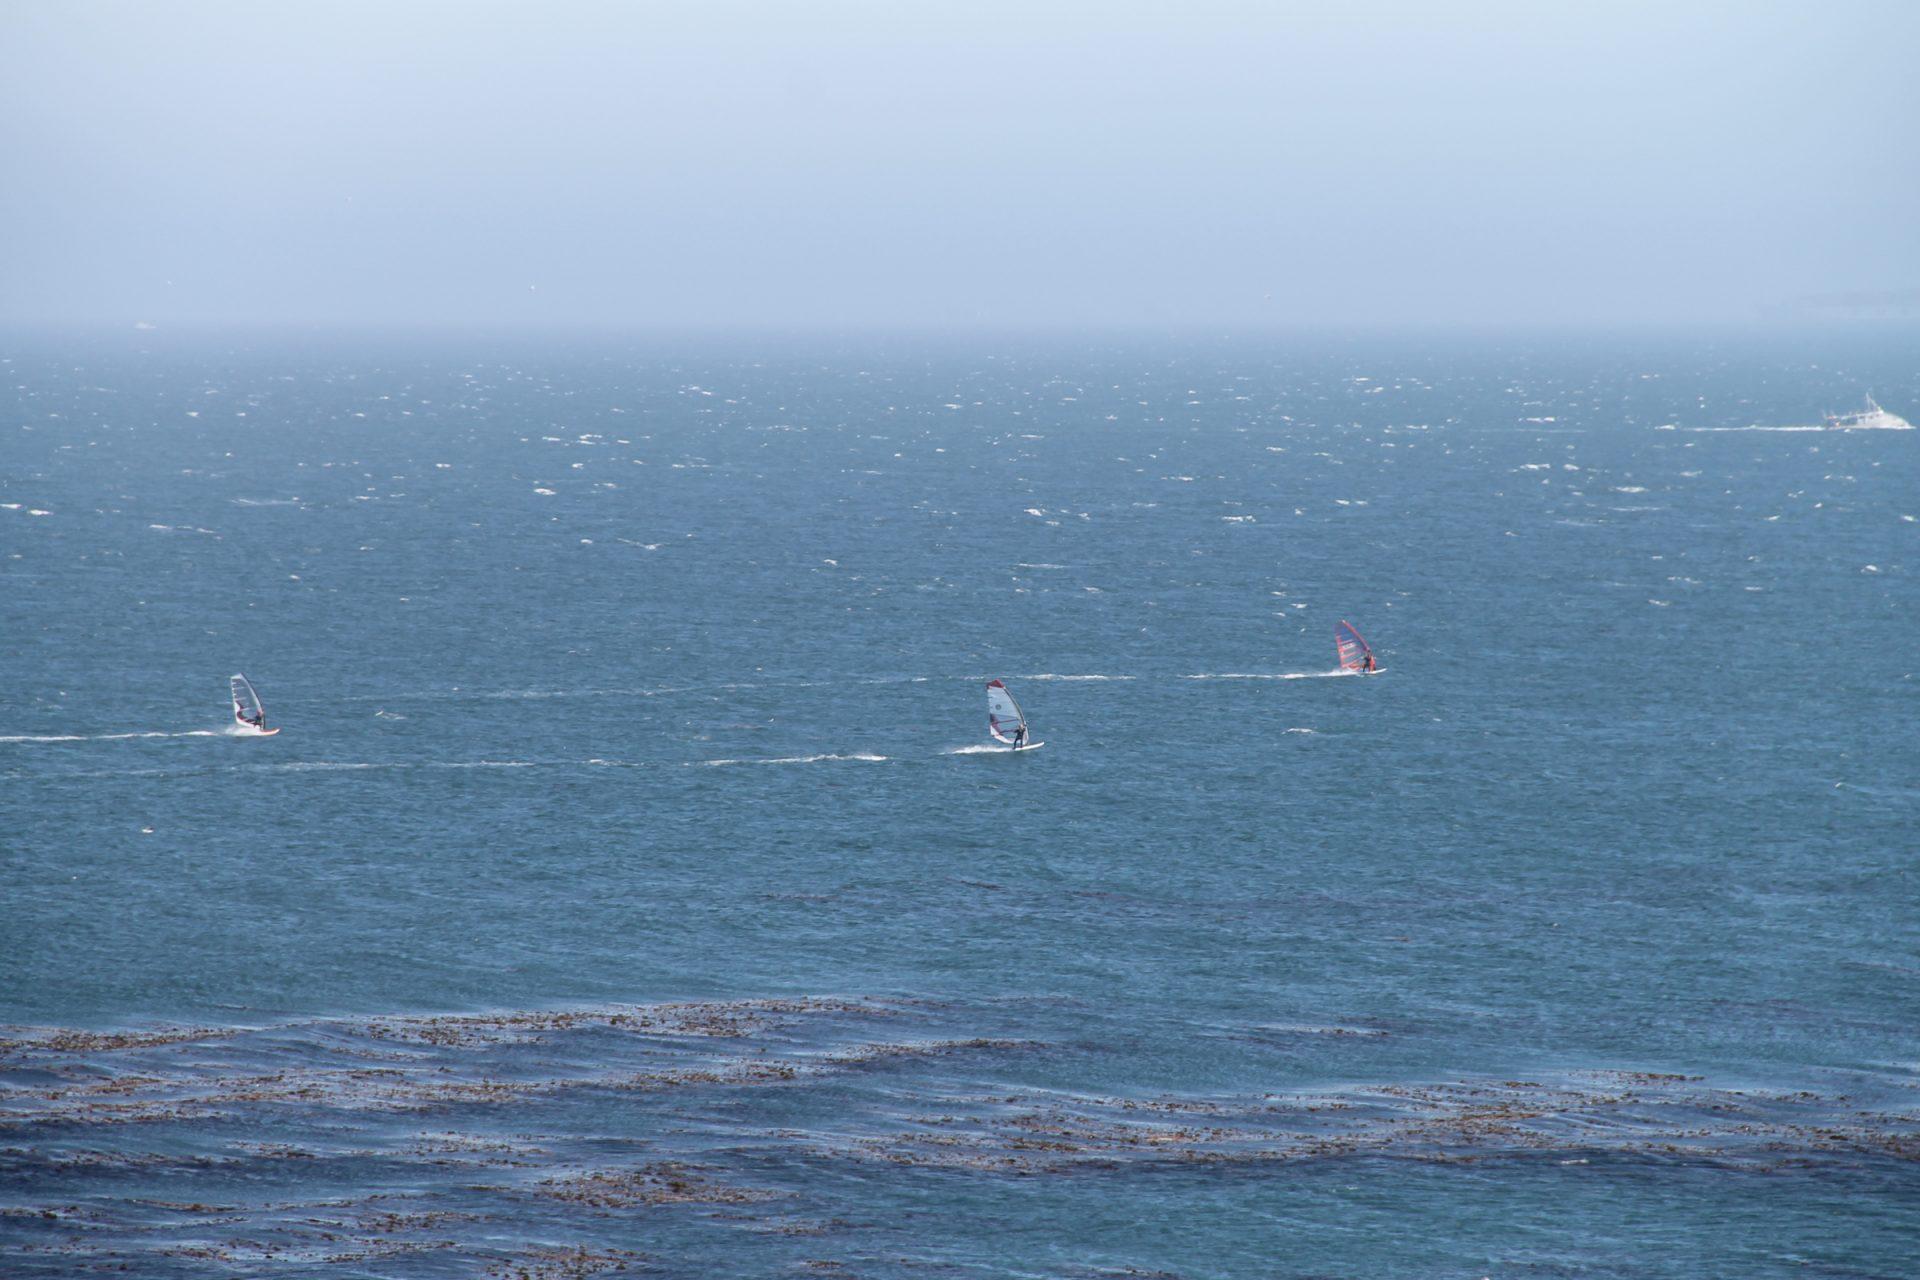 Windsurfers on Ocean